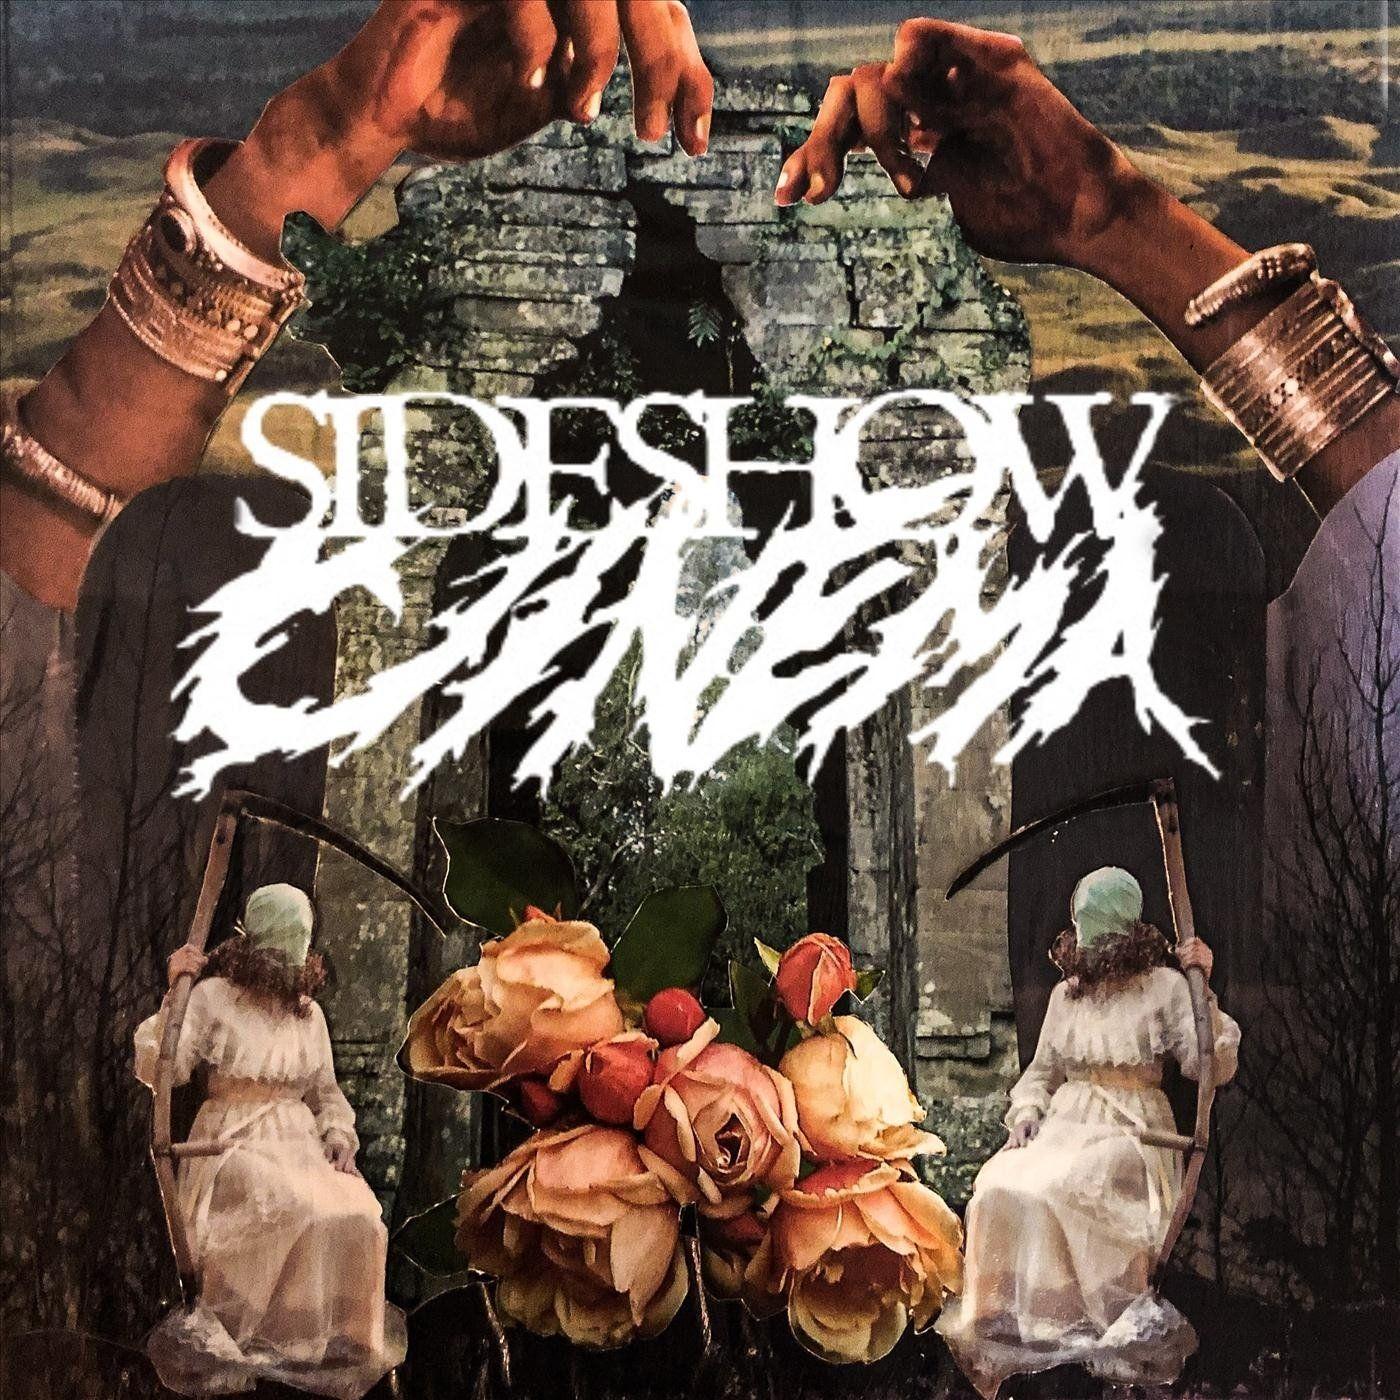 Sideshow Cinema - Sideshow Cinema [EP] (2020)